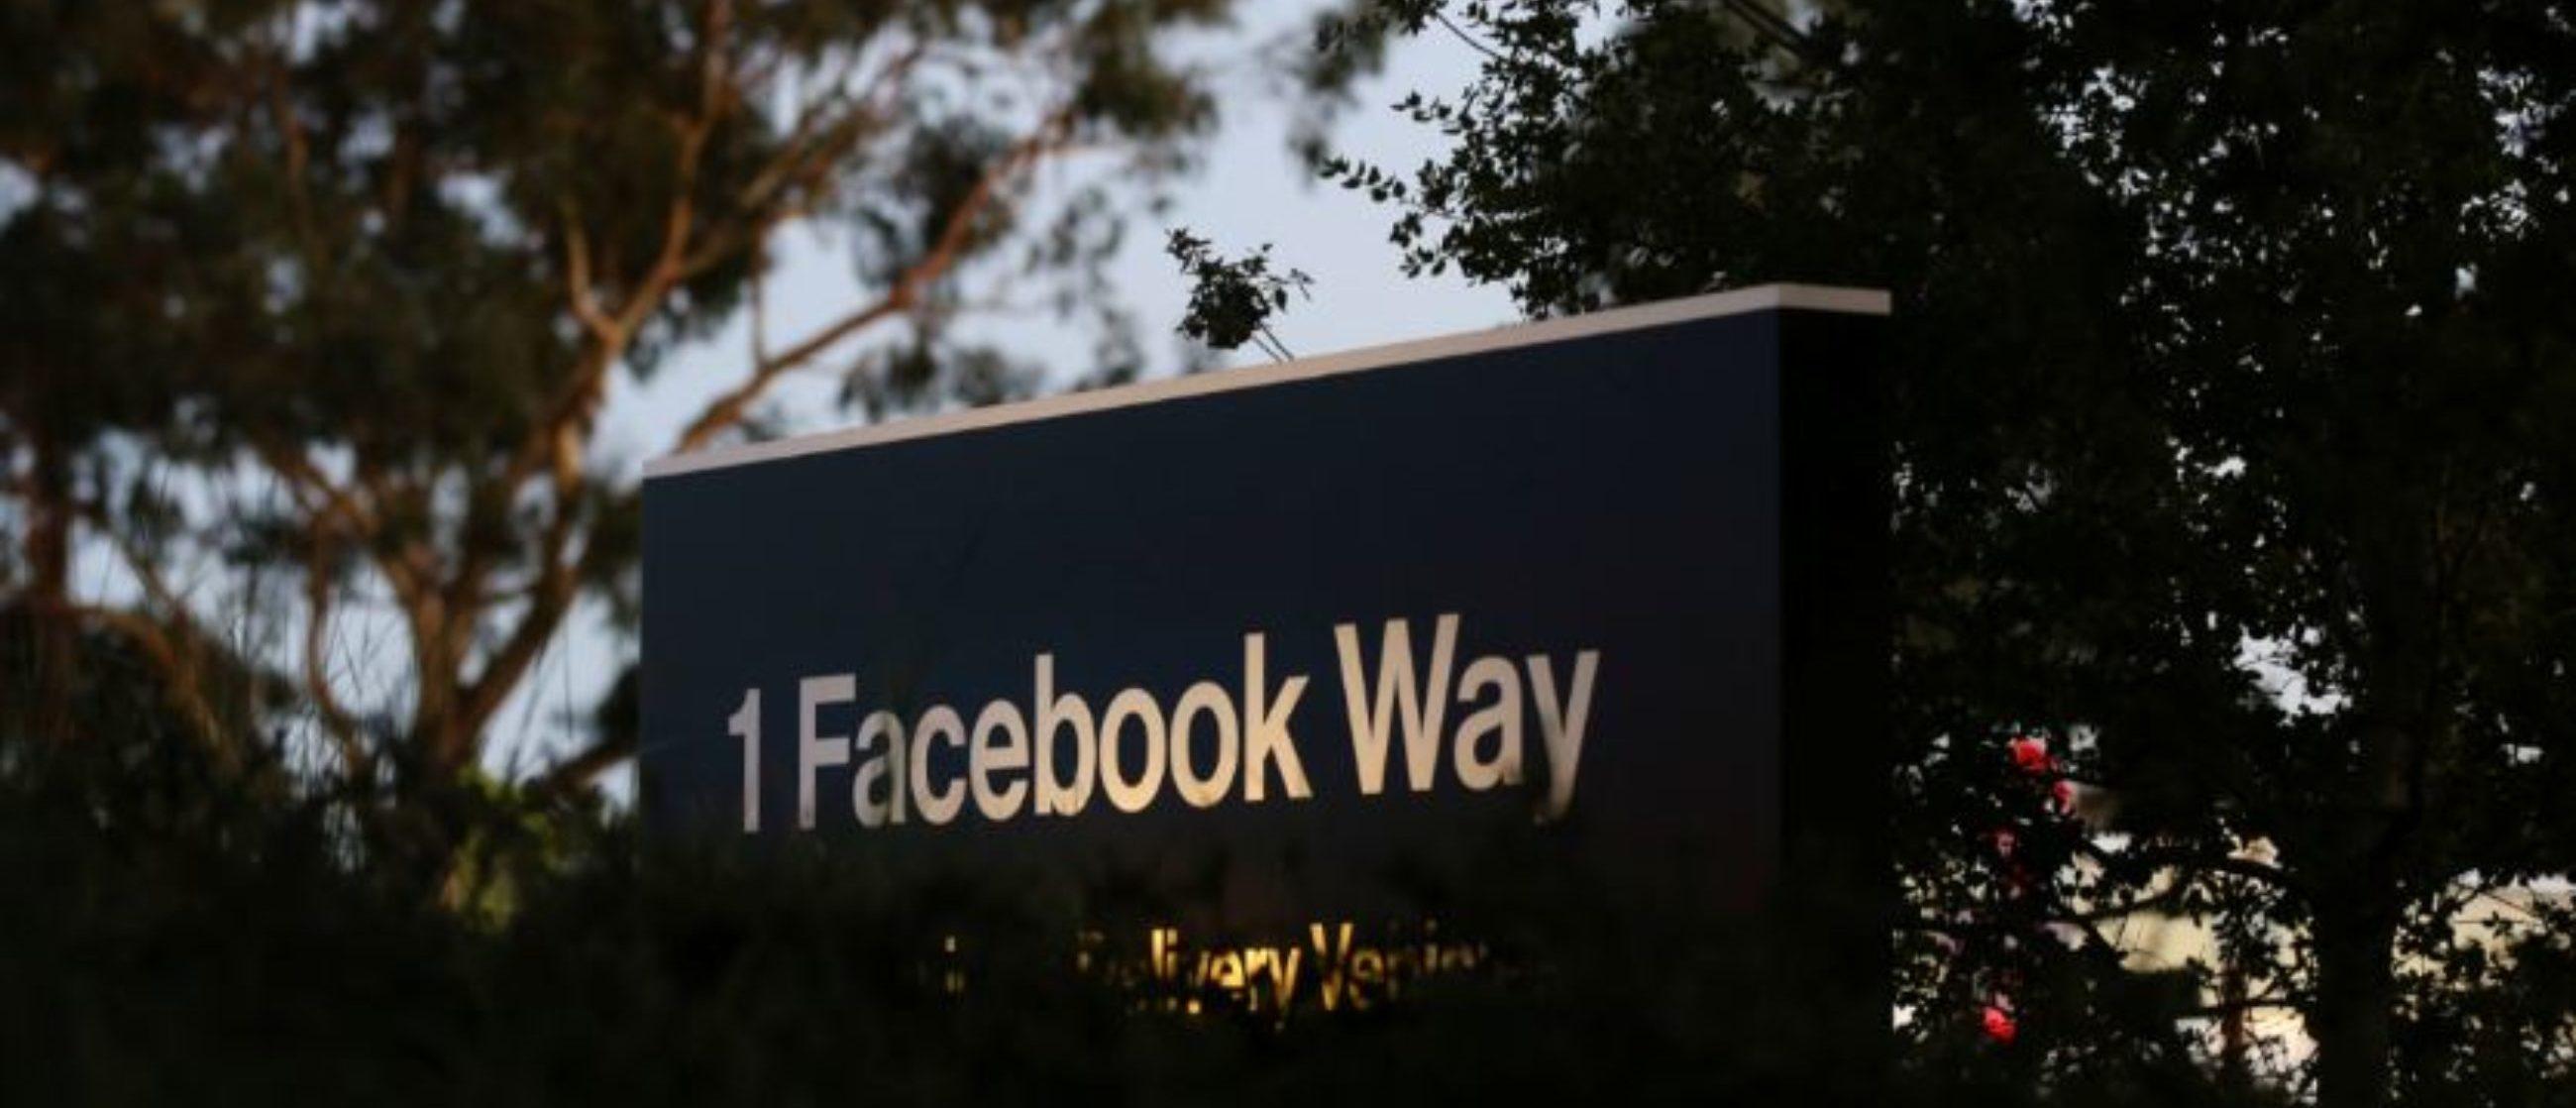 A Facebook address sign is seen at Facebook headquarters in Menlo Park, California, on Wednesday, October 10, 2018. REUTERS/Elijah Nouvelage